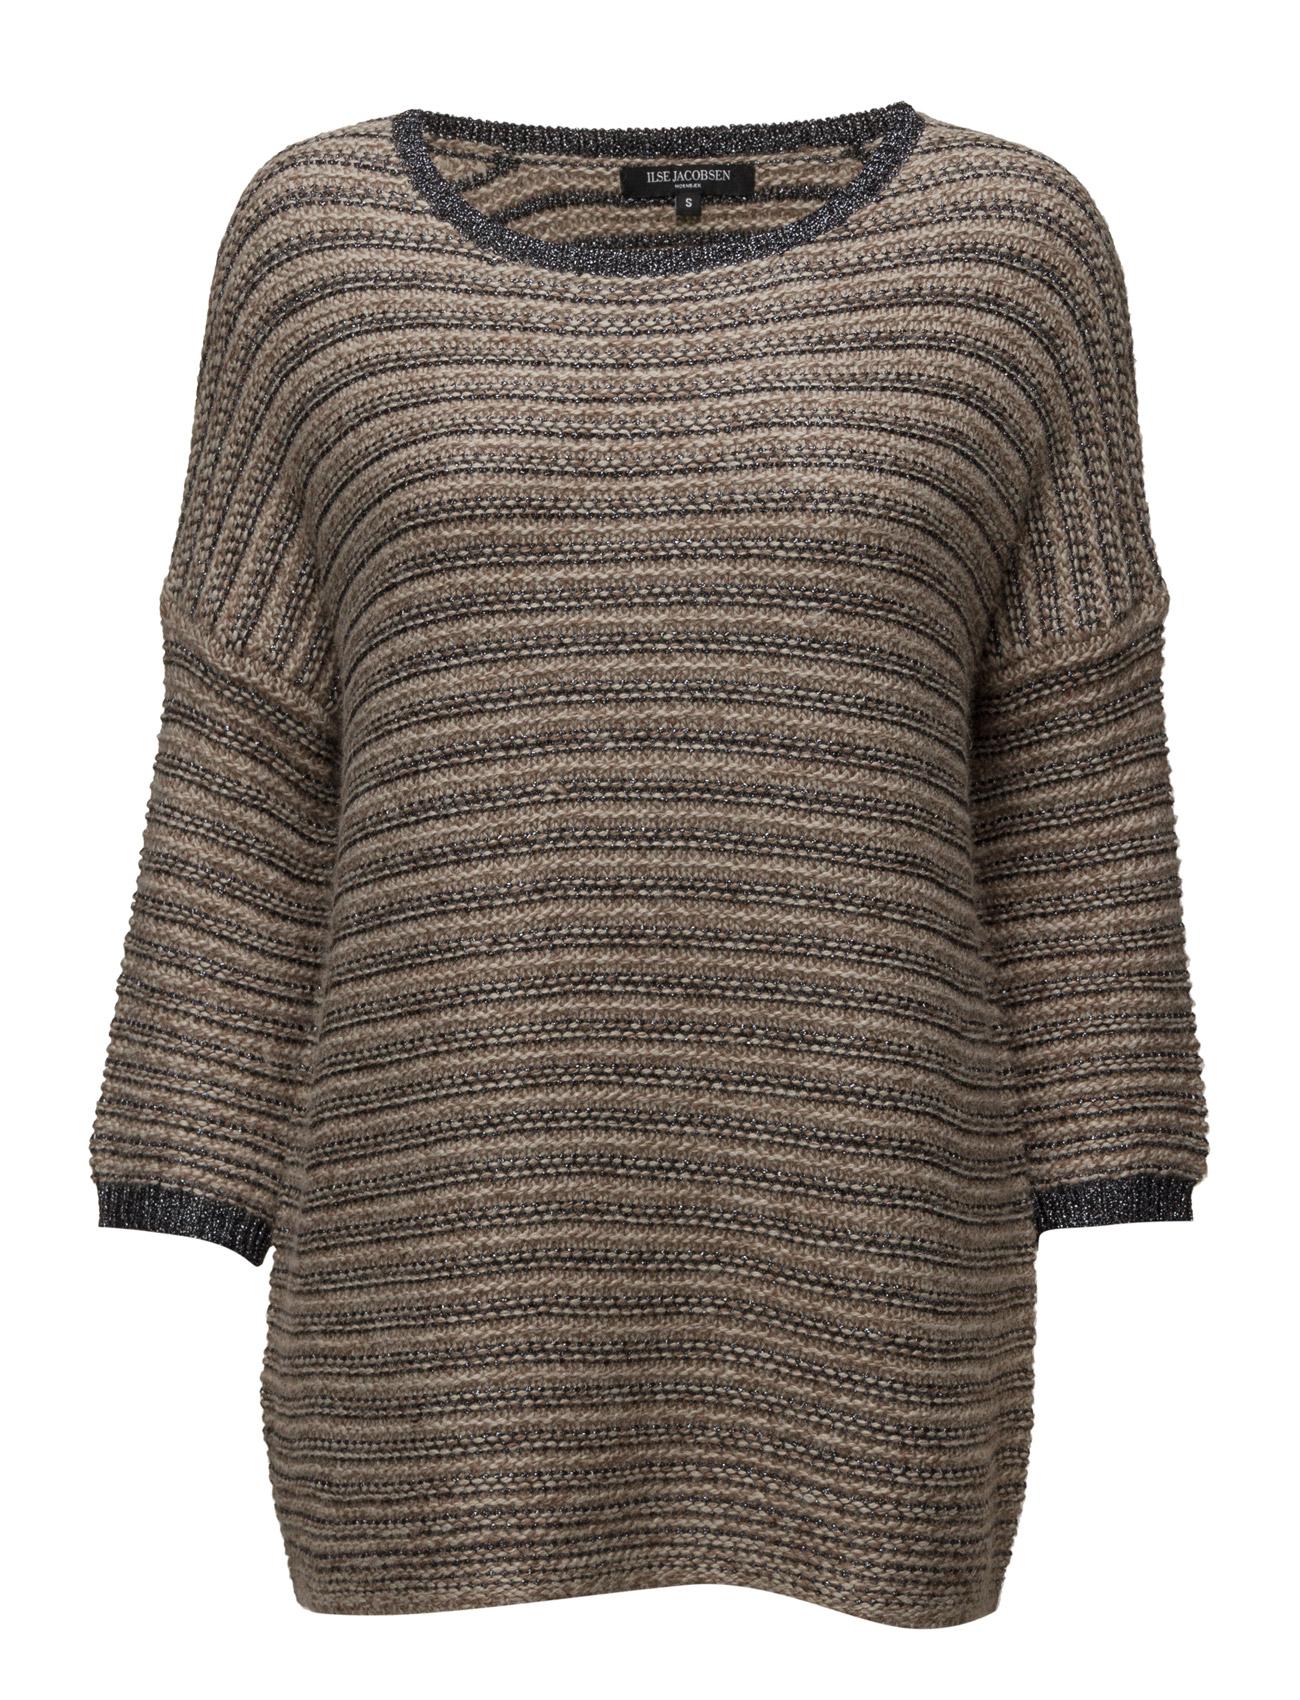 Womens Knit Pullover Ilse Jacobsen Sweatshirts til Damer i Atmosfære